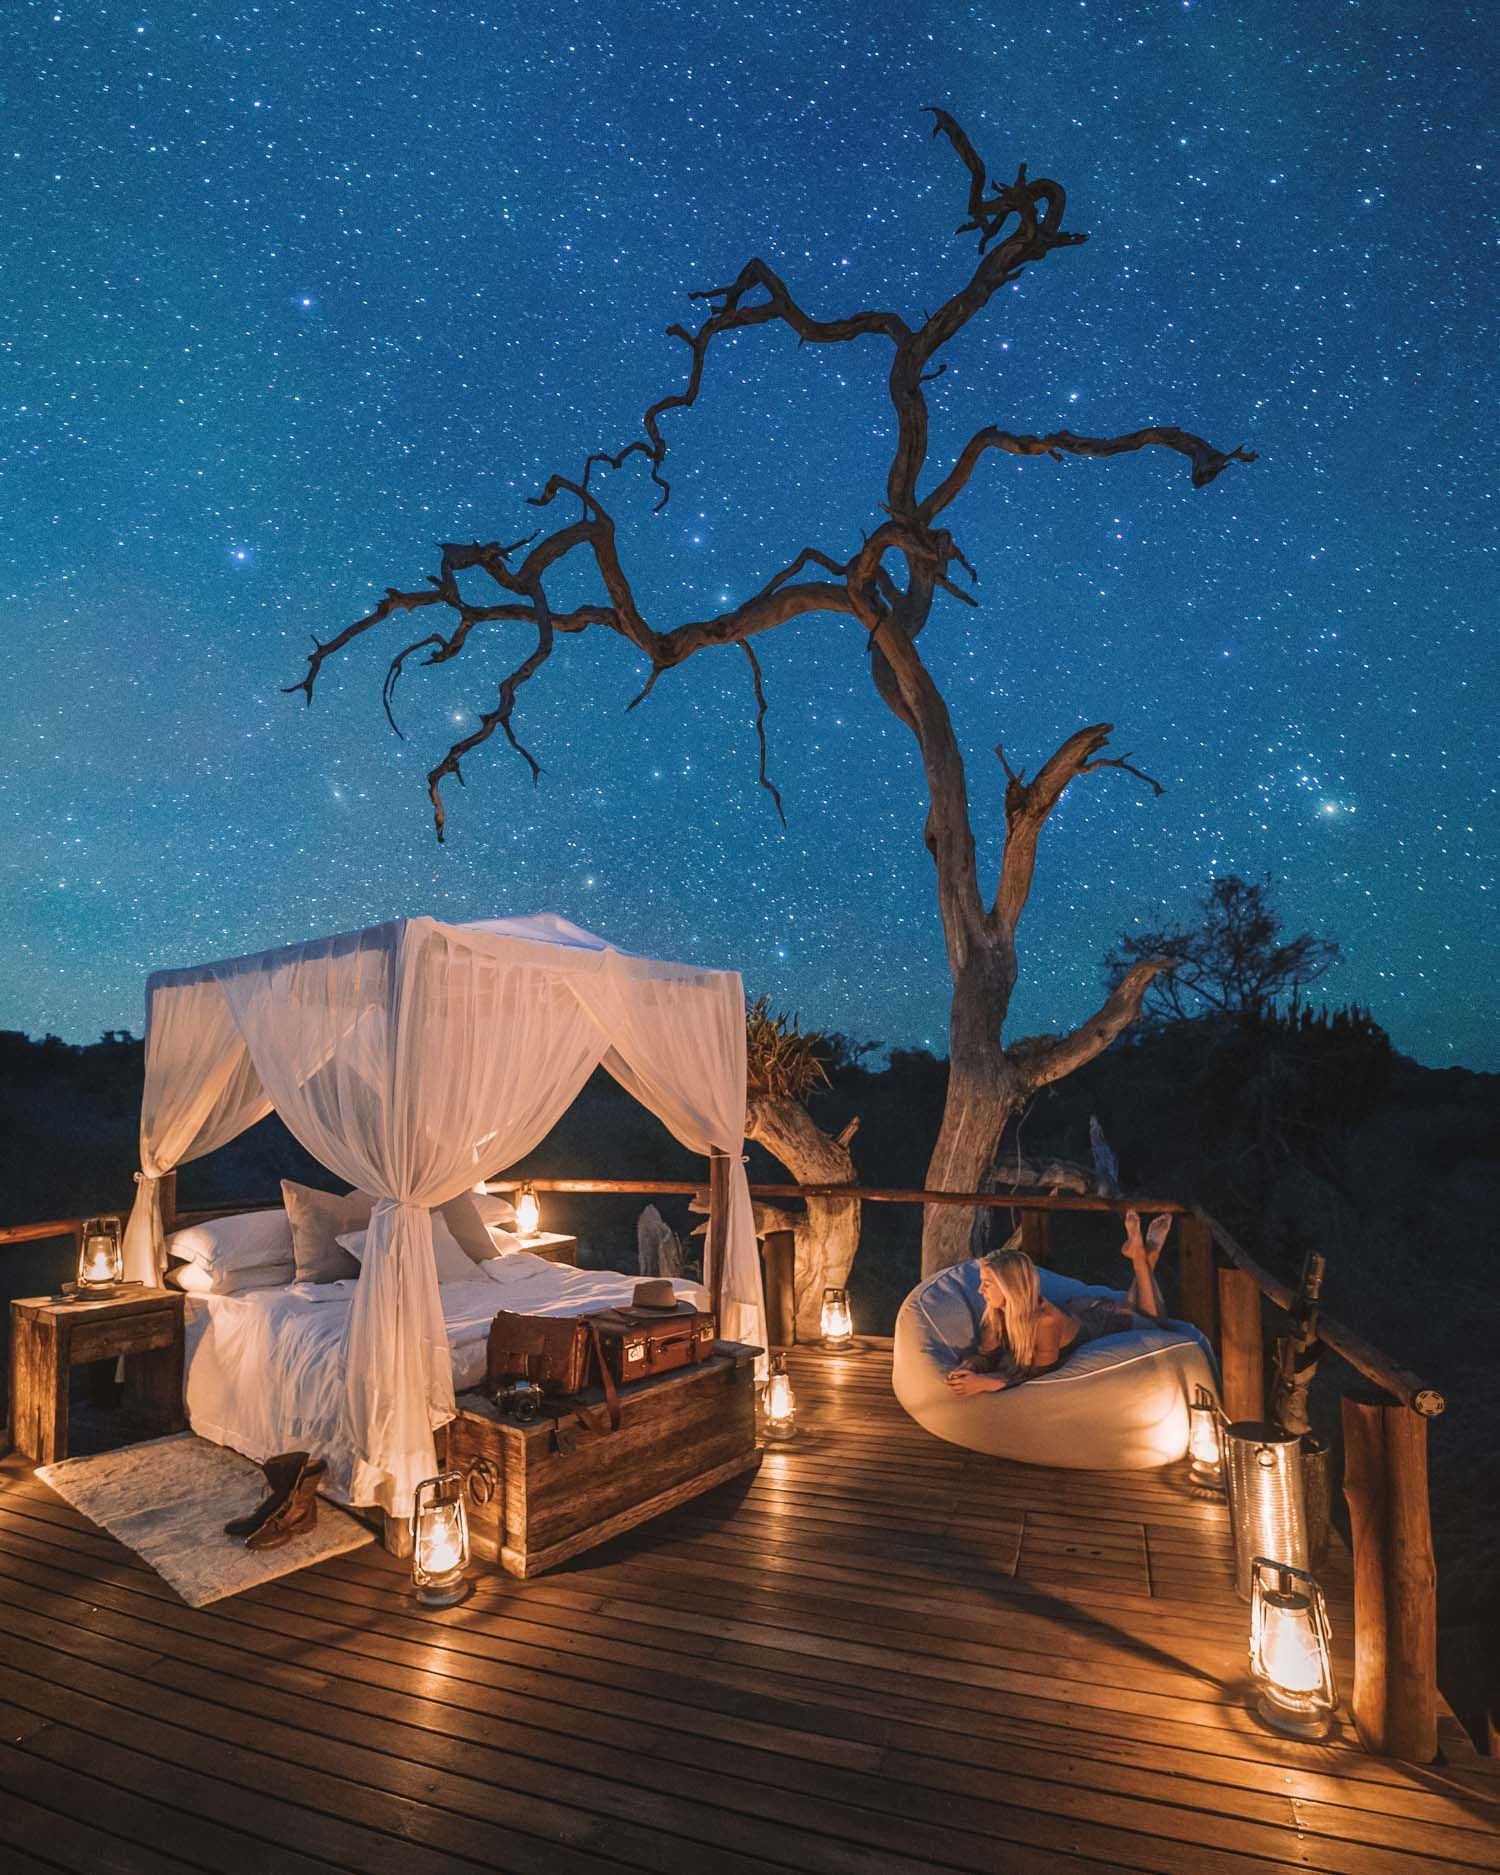 Destinasi Petualangan untuk Sepasang Kekasih yang Romantis